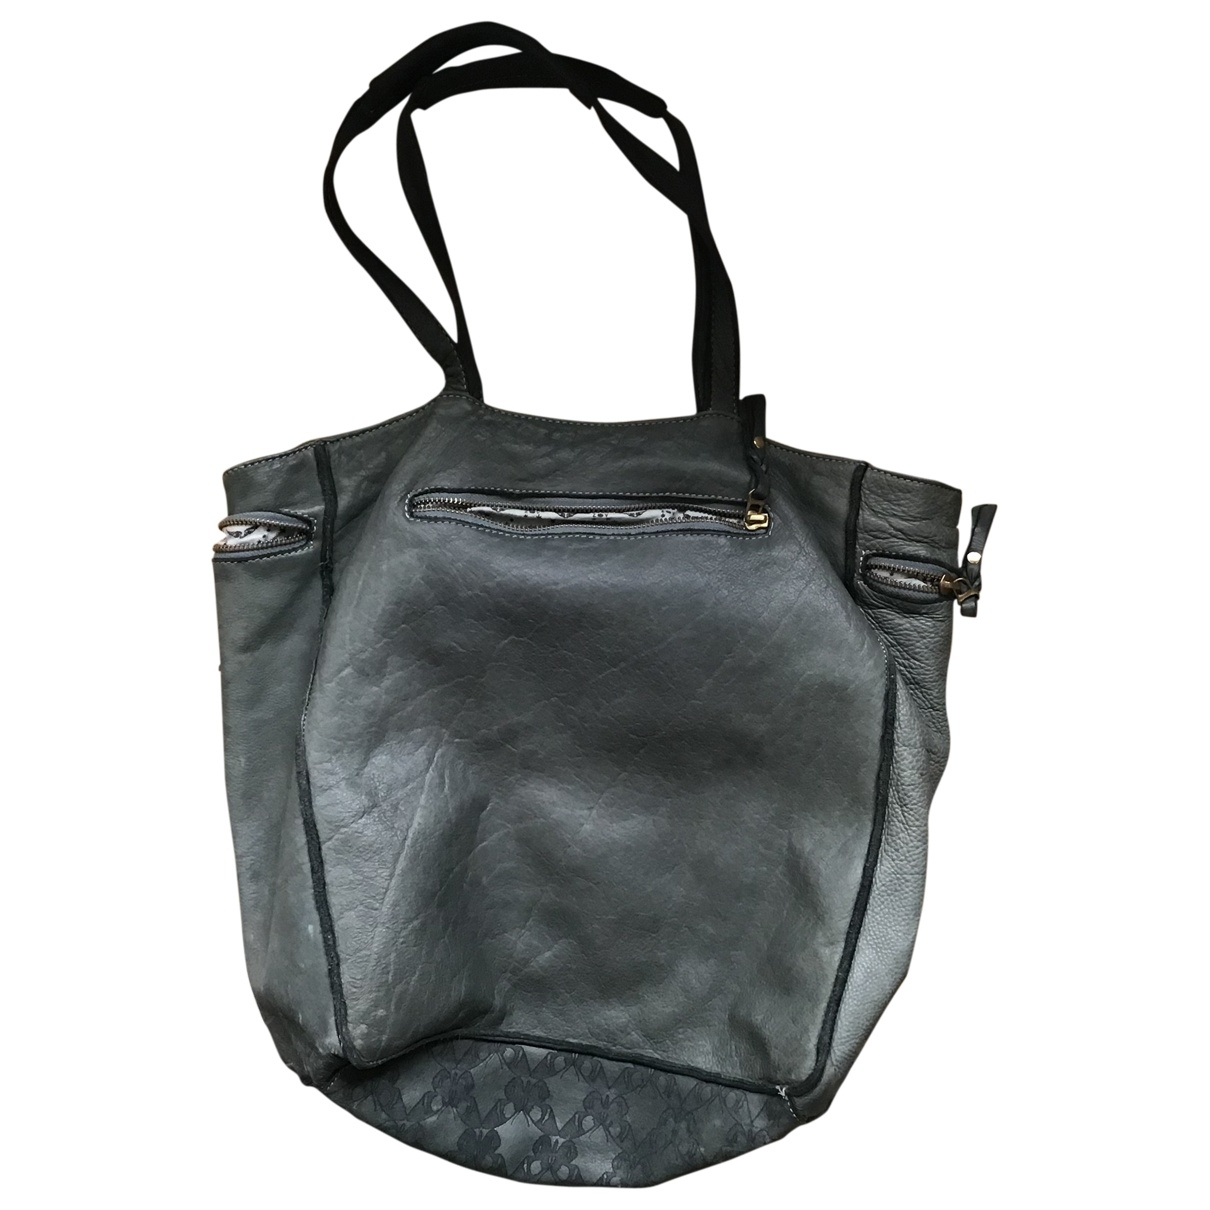 Zadig & Voltaire \N Khaki Leather handbag for Women \N